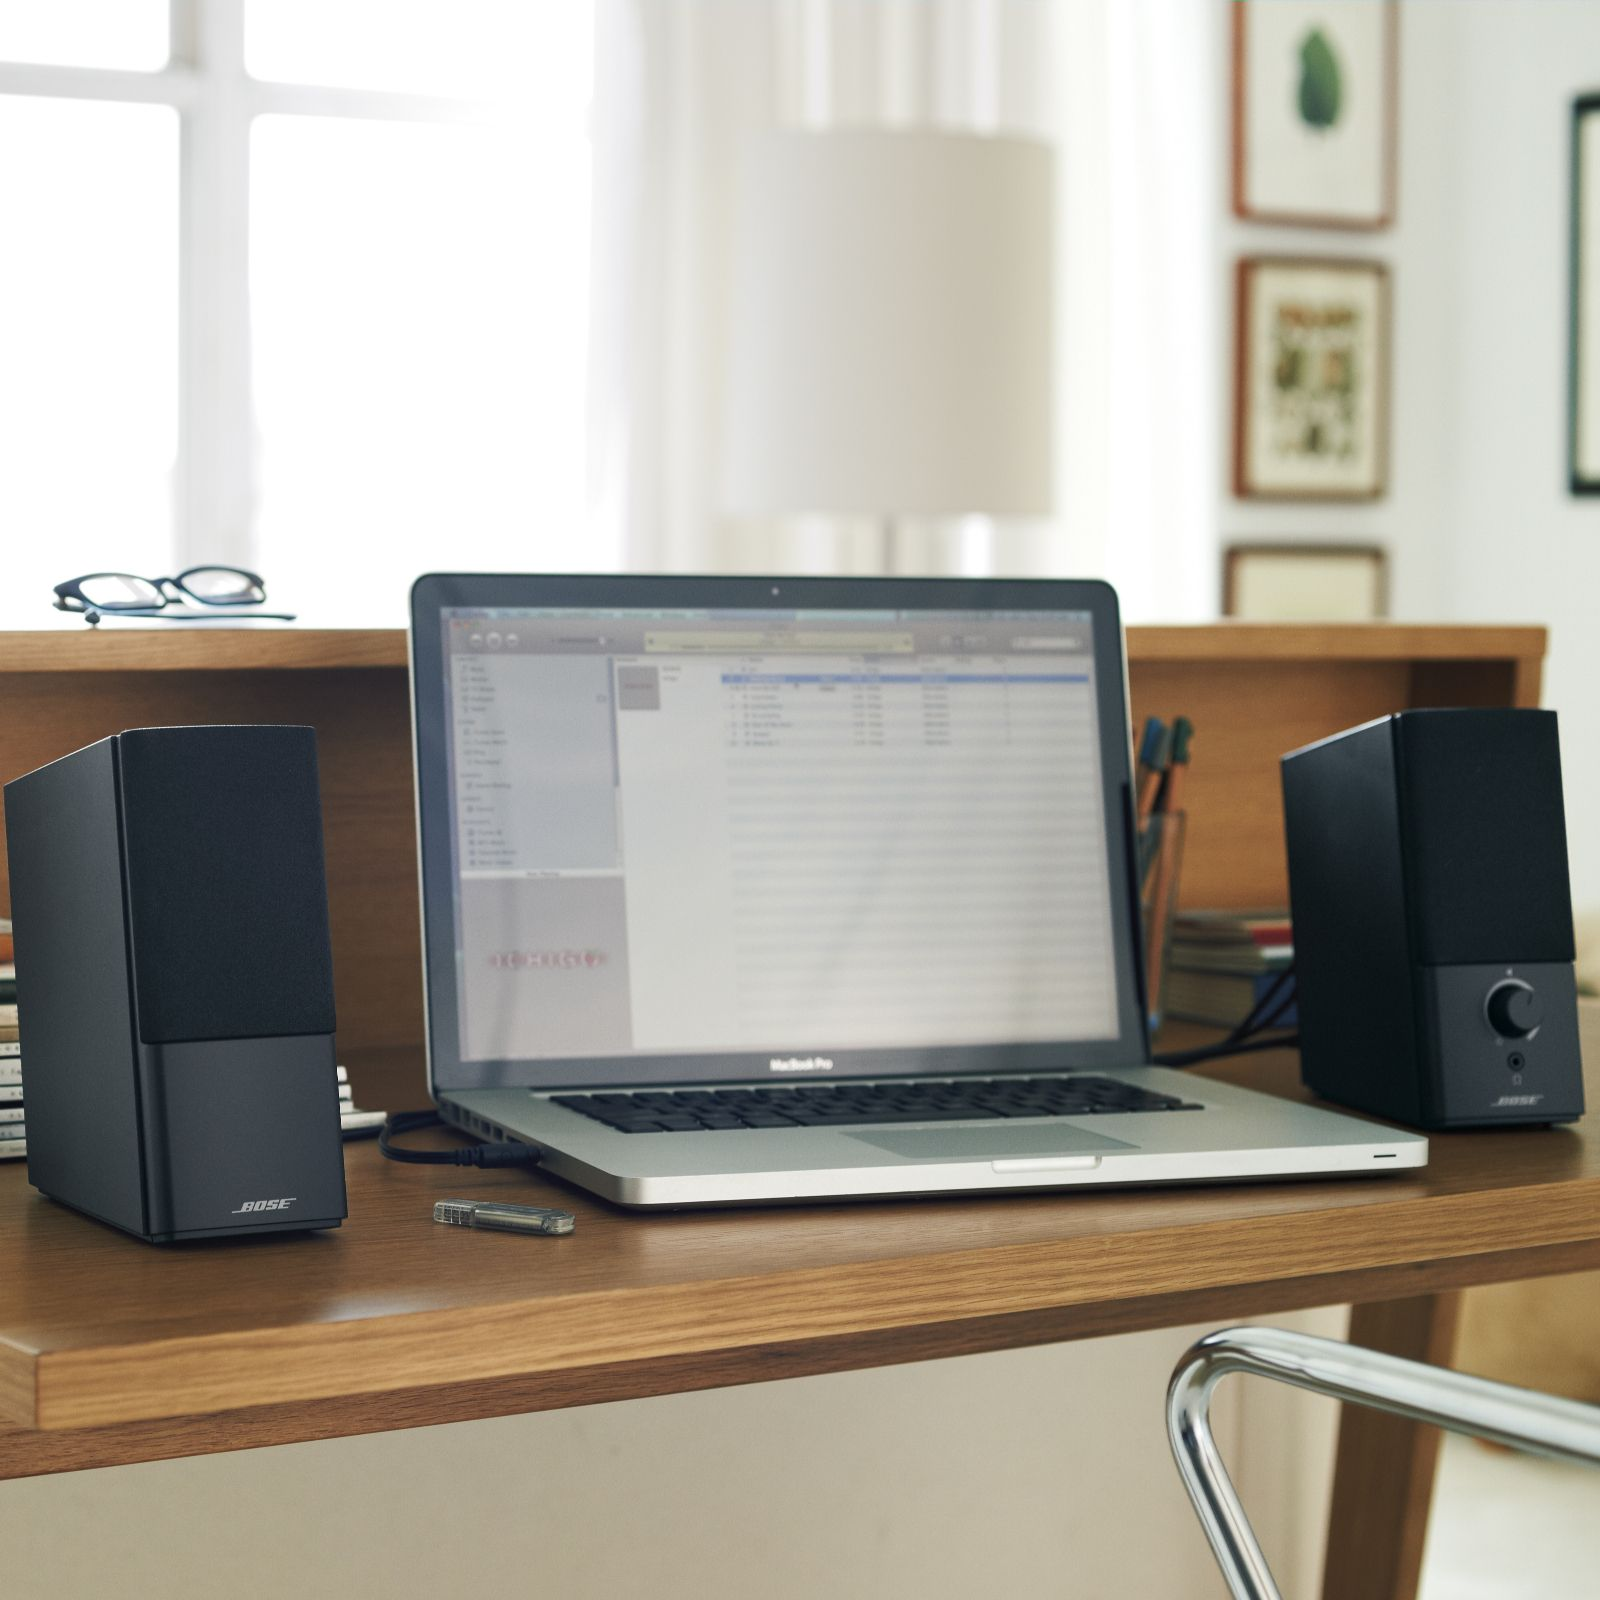 bose companion 2 speakers. bose companion 2 speakers e